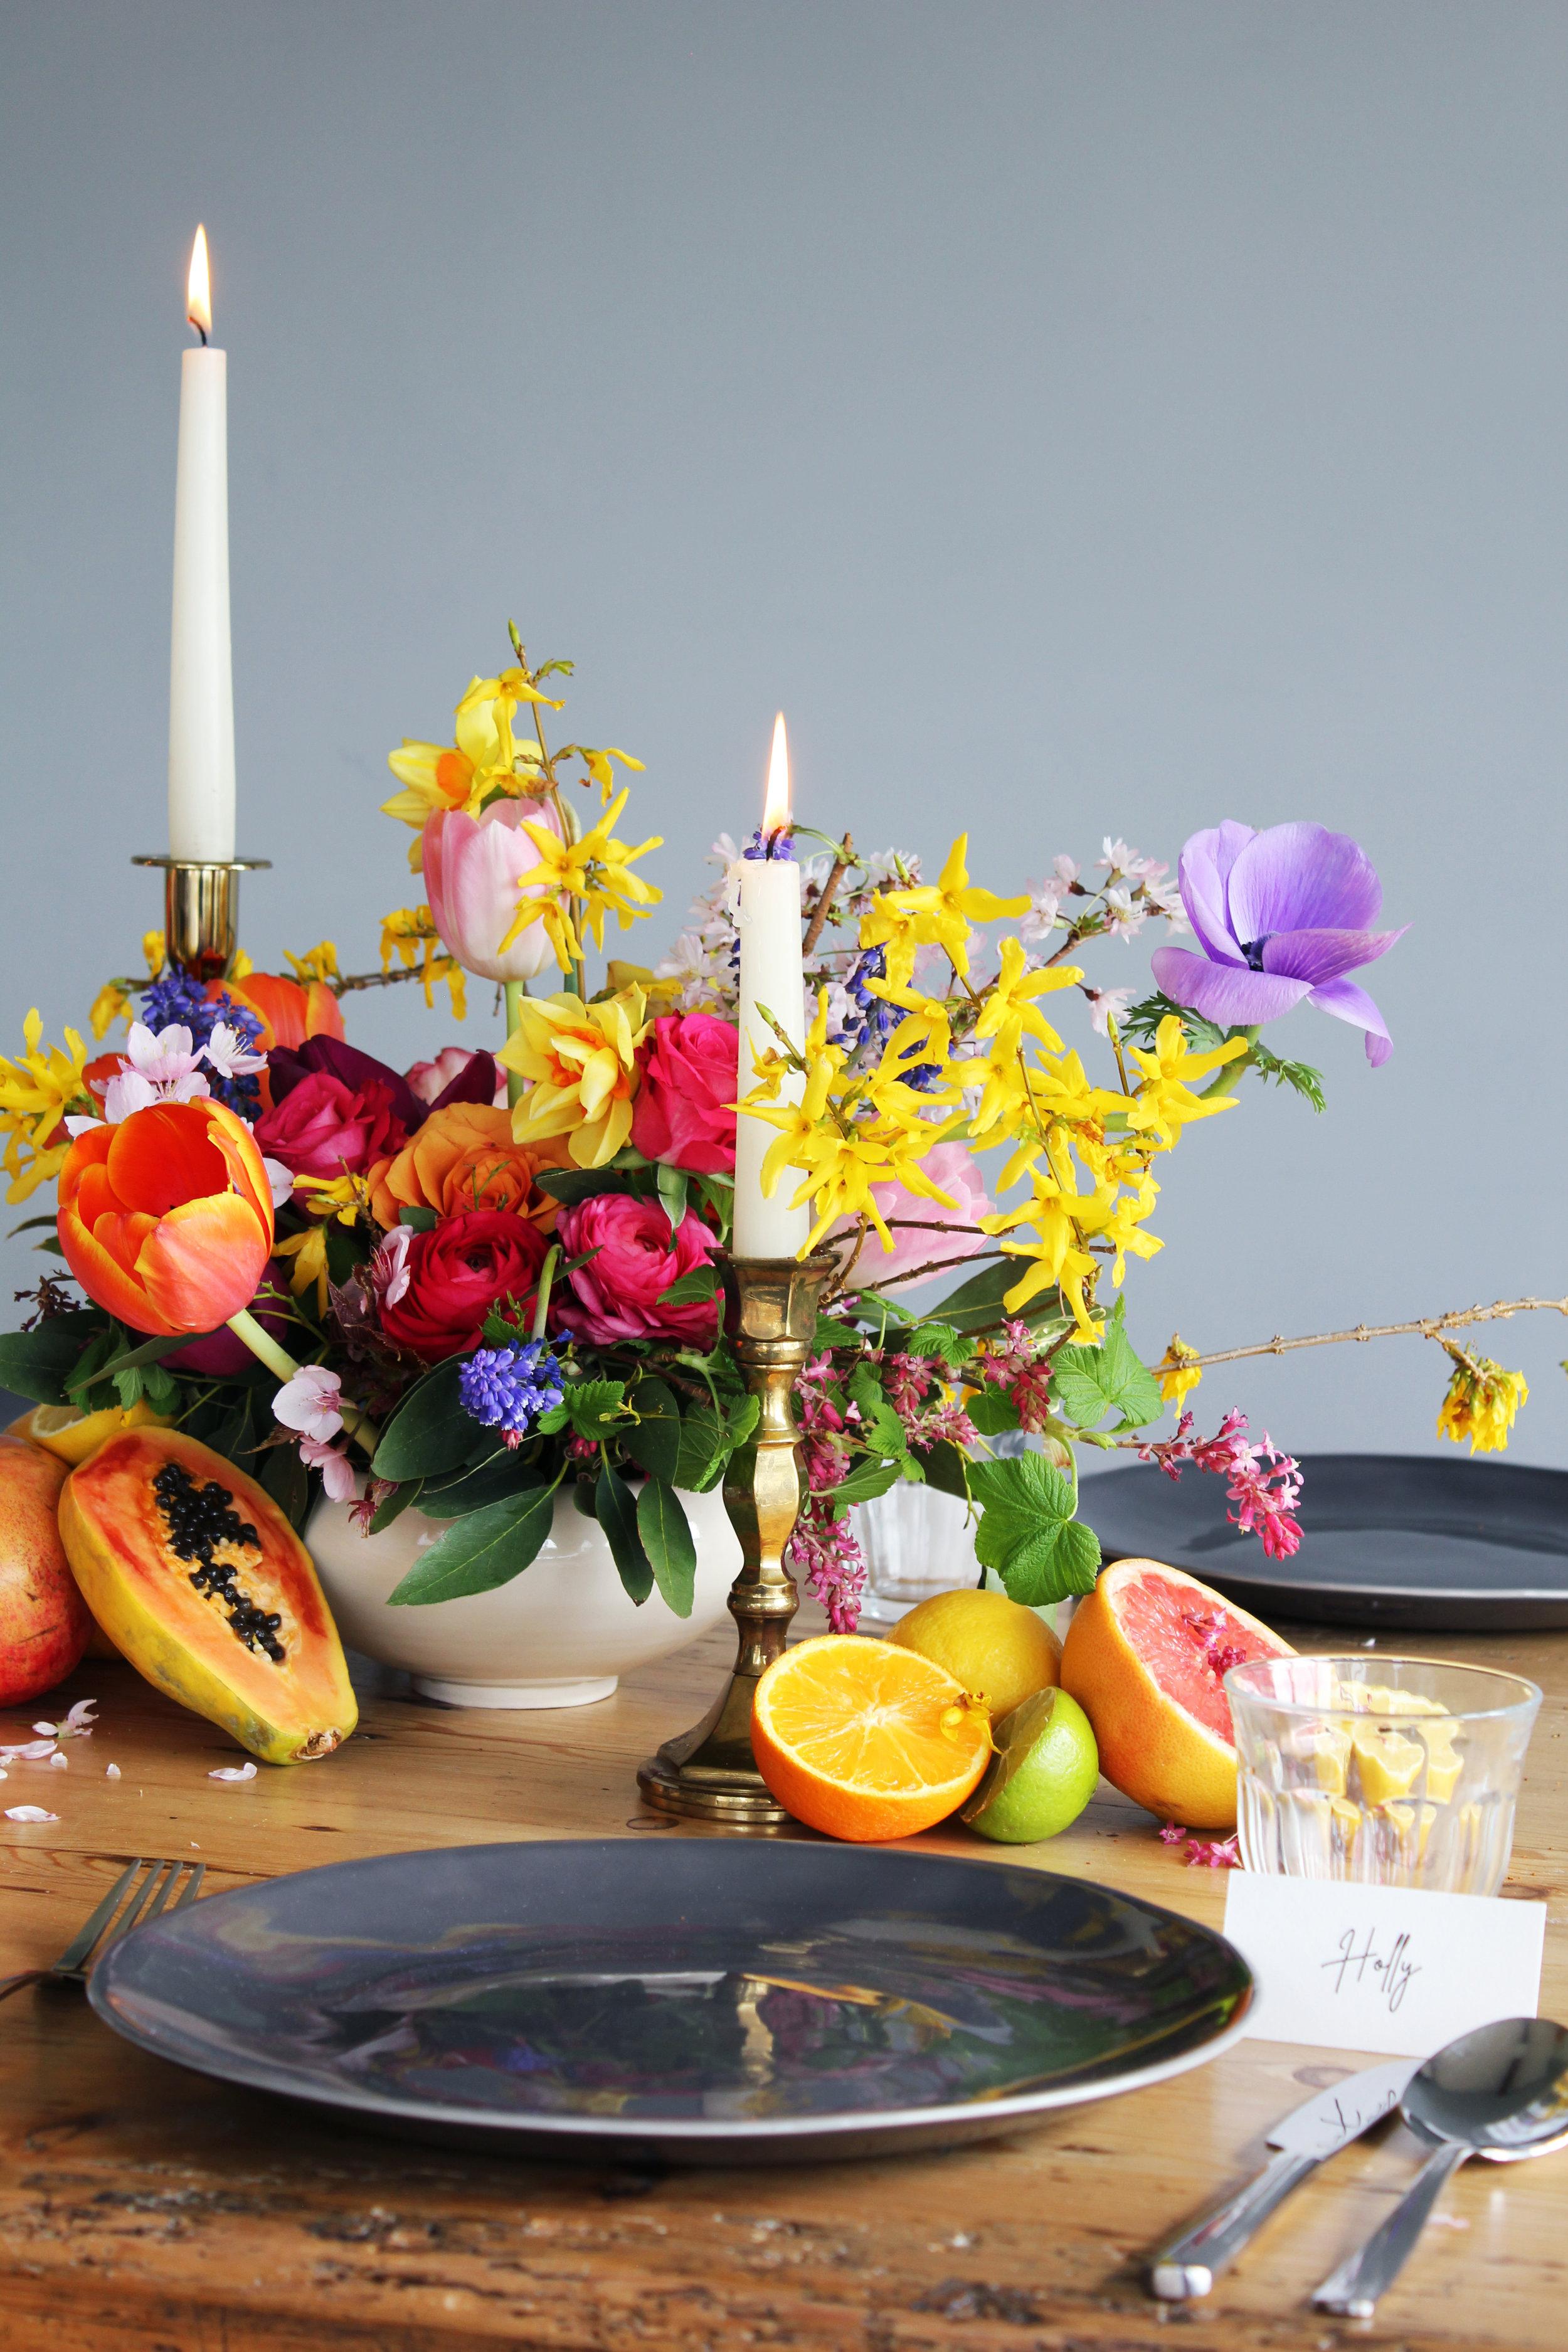 Callie-Pettigrew-Fruity-Florals-9.jpg